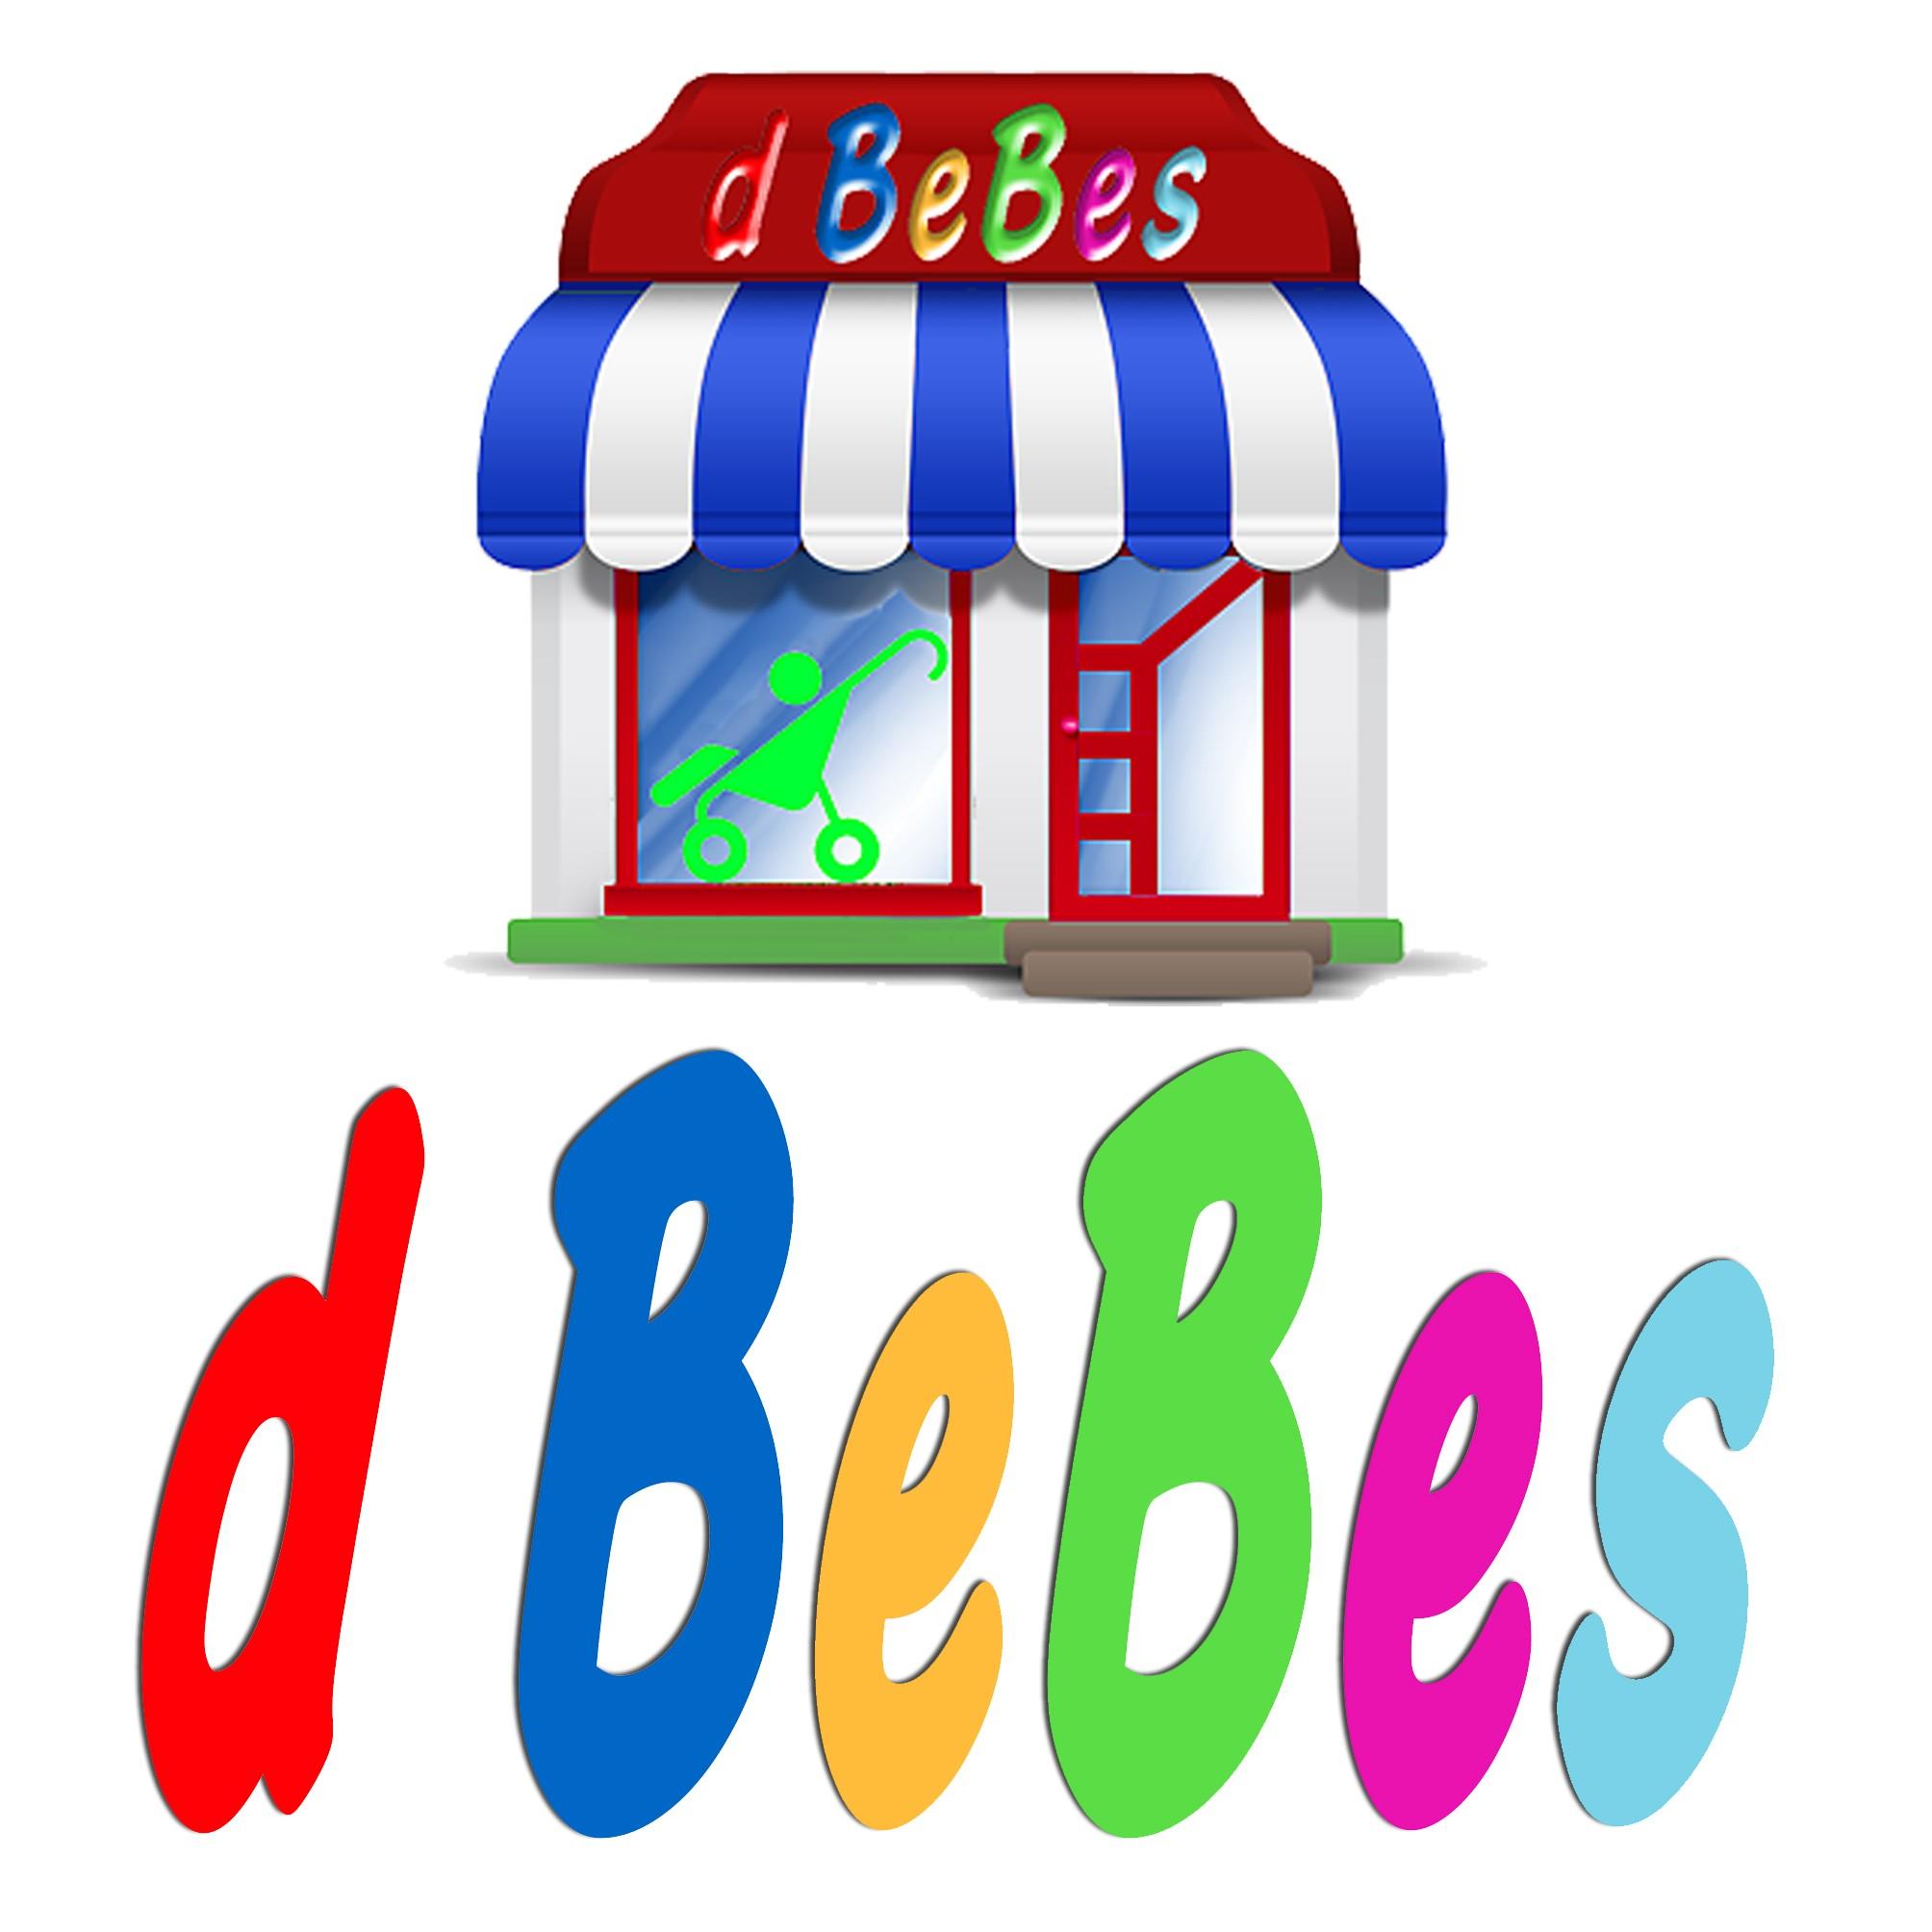 Tiendadebebes DBebes